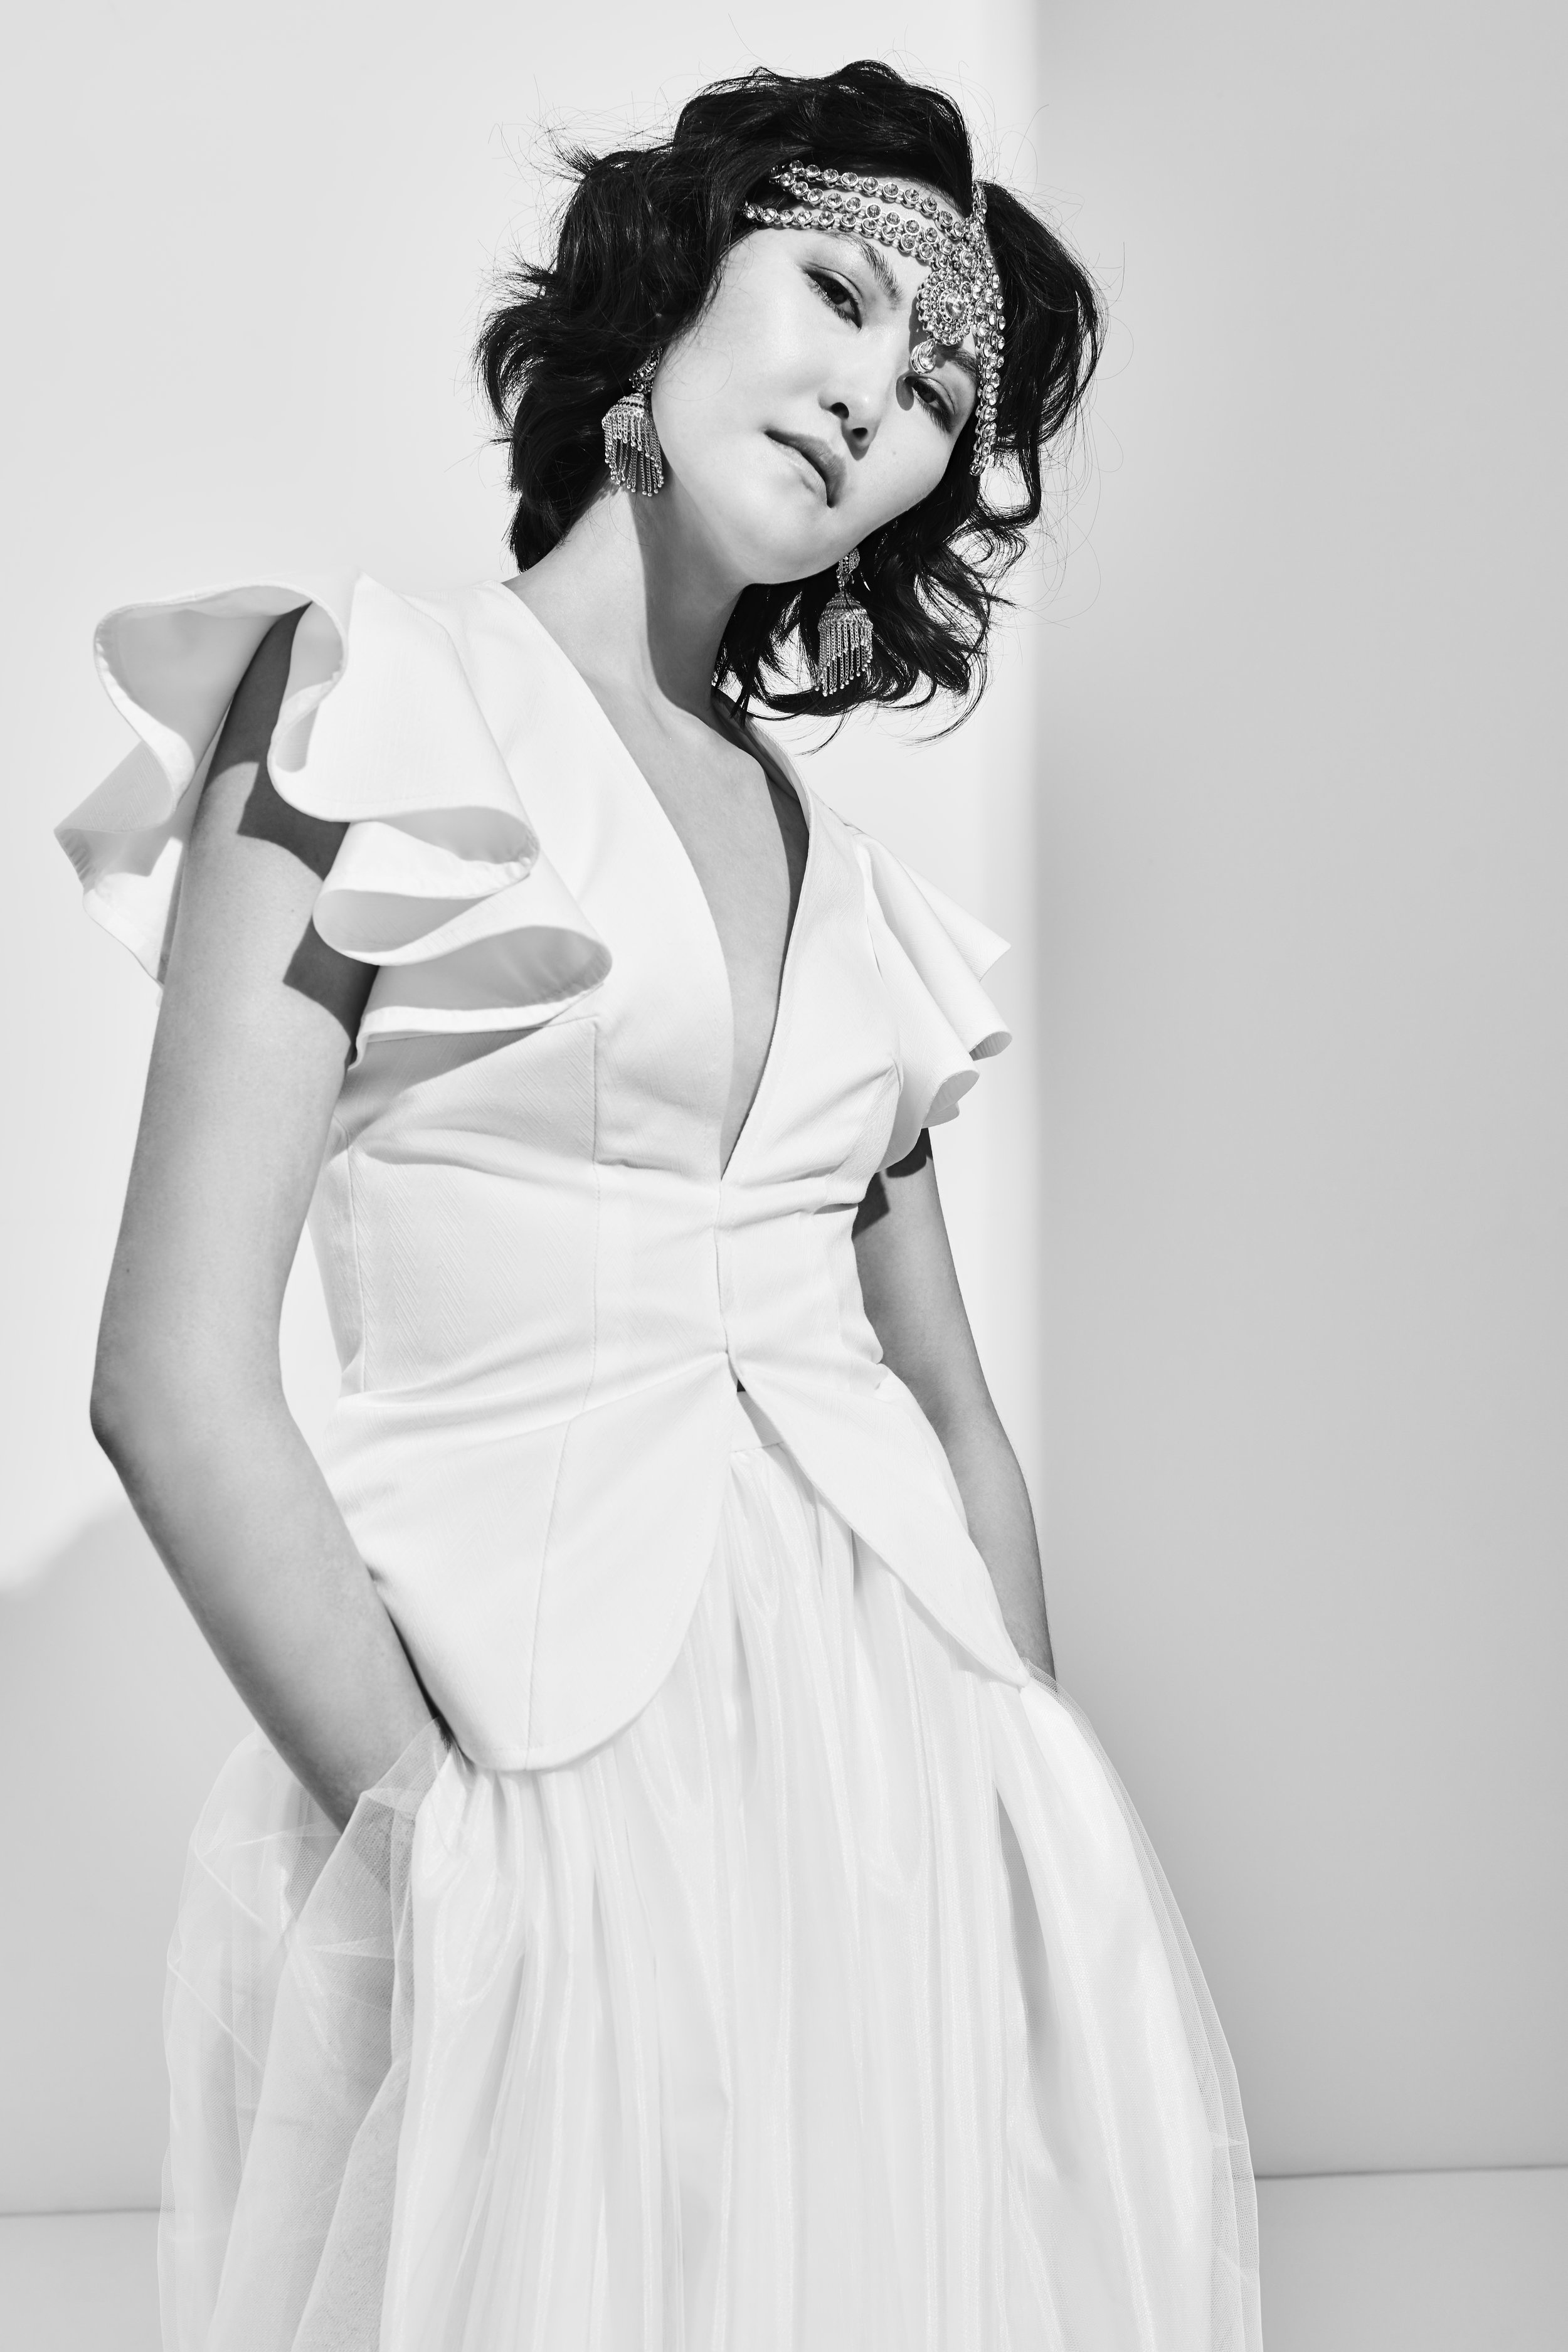 Photographer: Tim van der Most Hair&Make-up: Wout Philippo Model: Mendsaikhan Mendee Stylist accessories: Debby Koijen